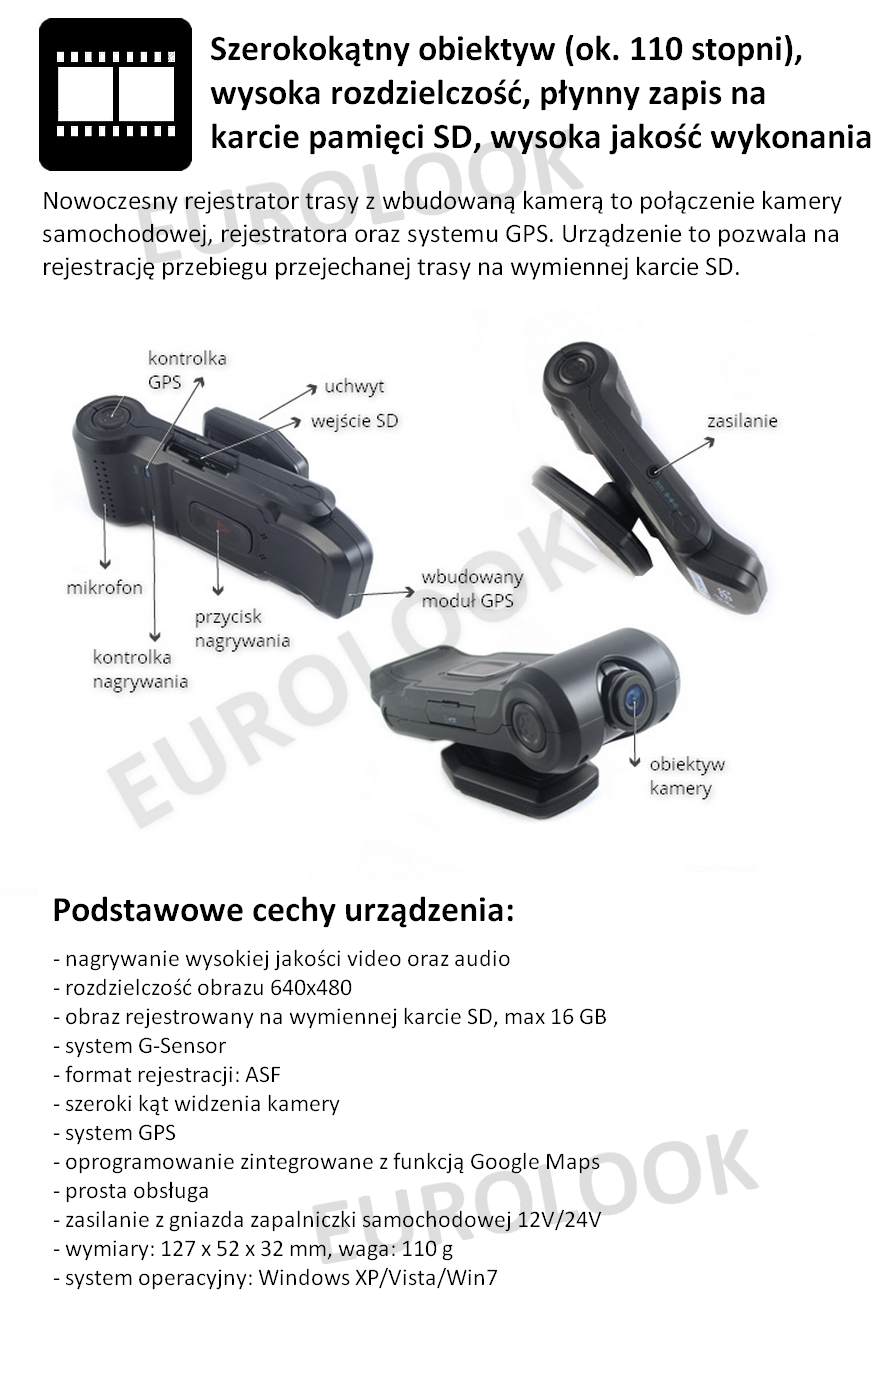 http://zdjecia.dobre-systemy.pl/gdcar/4.png